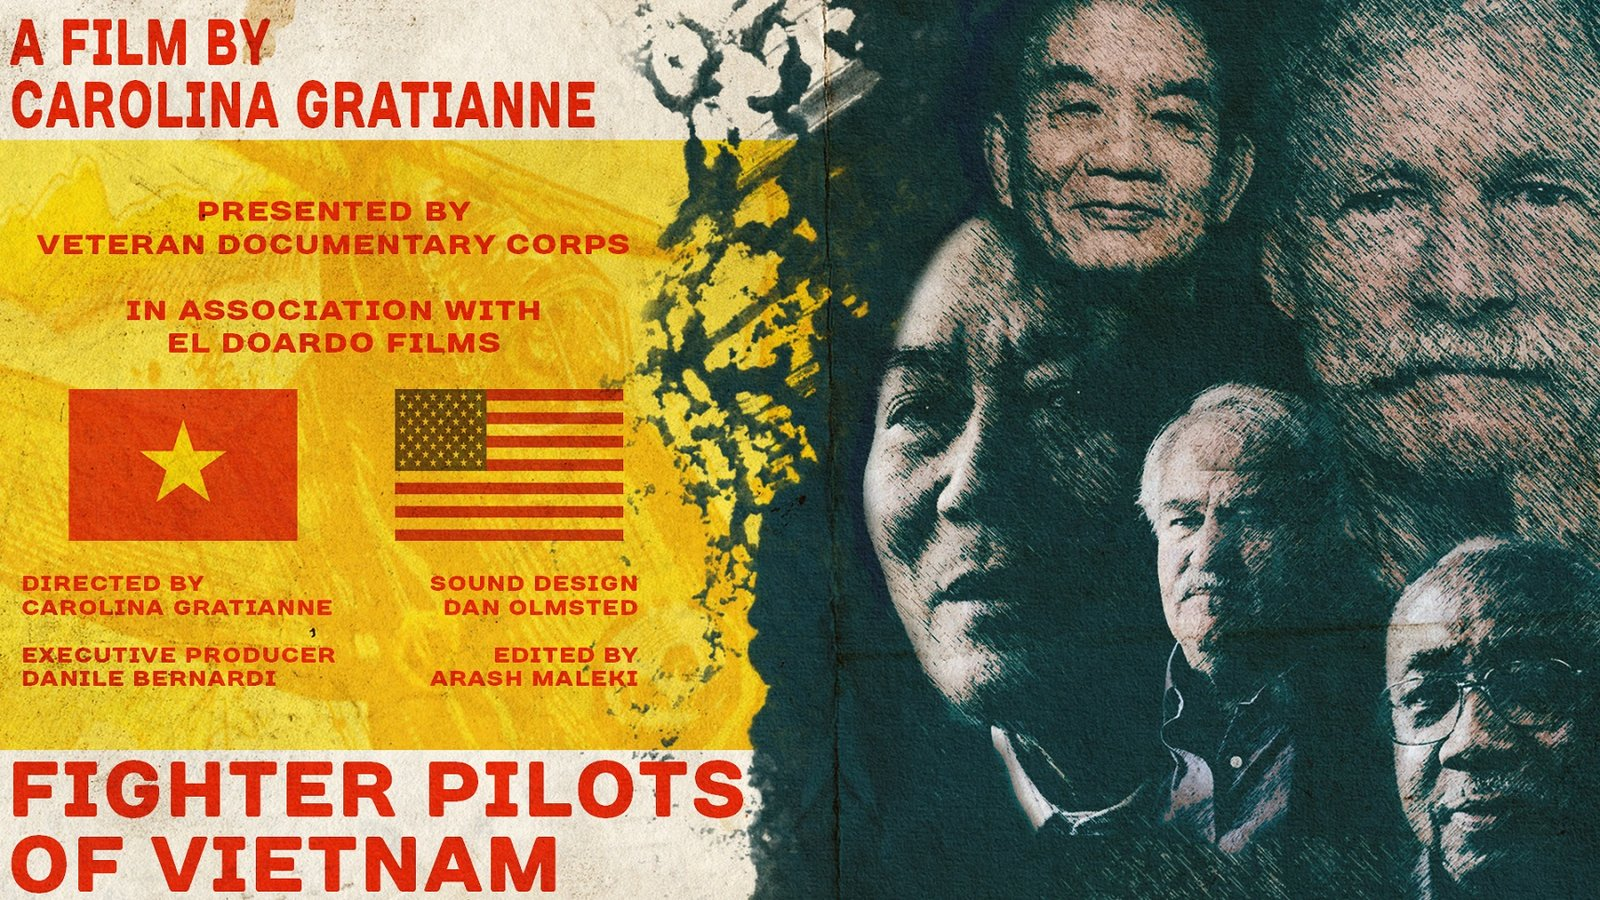 Fighter Pilots of Vietnam - A Group of Vietnam Veterans Tell Their Stories